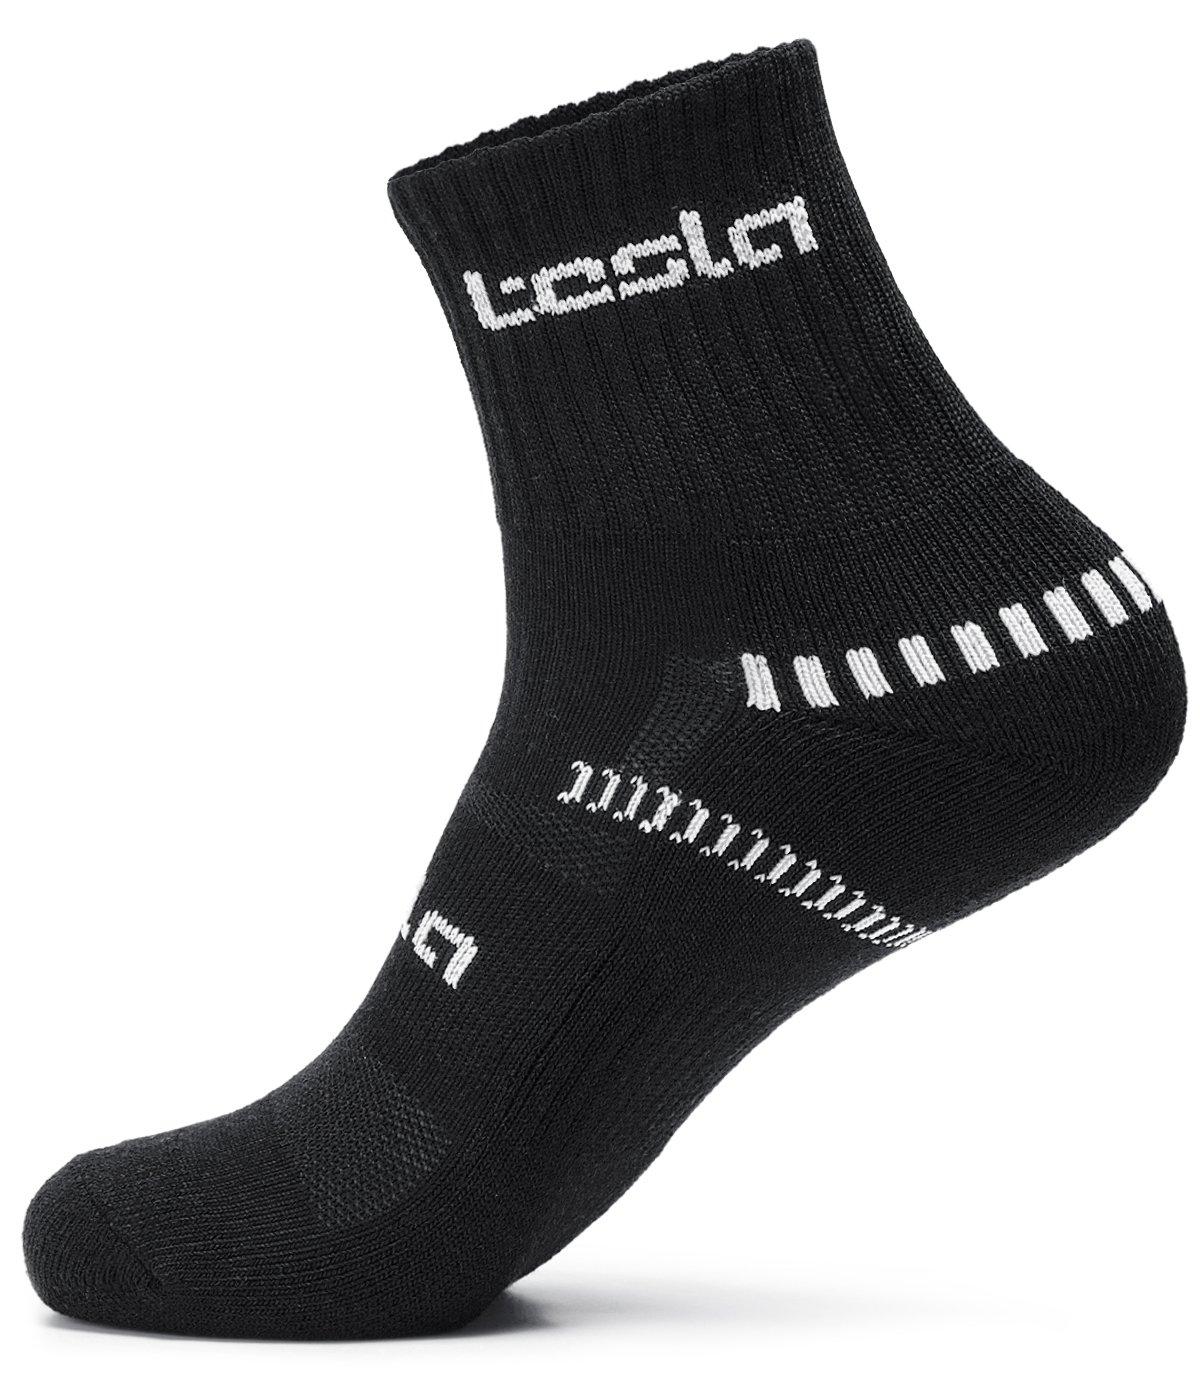 TSLA Mens 6-Pairs Atheltic Crew /& Mid-Calf Socks Cushioned Sports Comfort MZS Series Tesla Gears